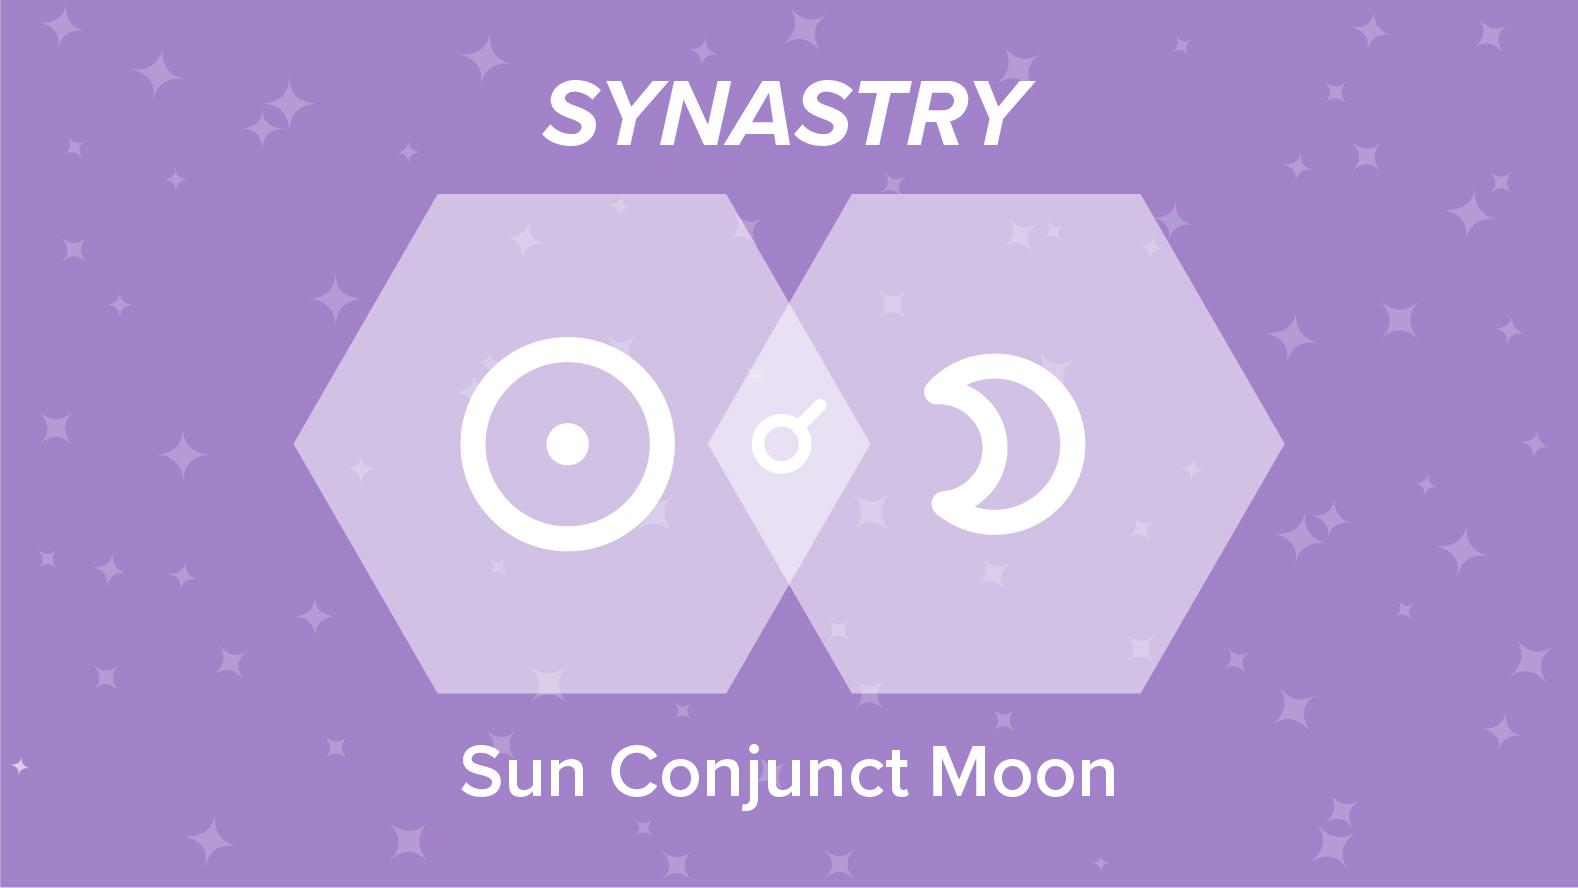 Sun Conjunct Moon Synastry